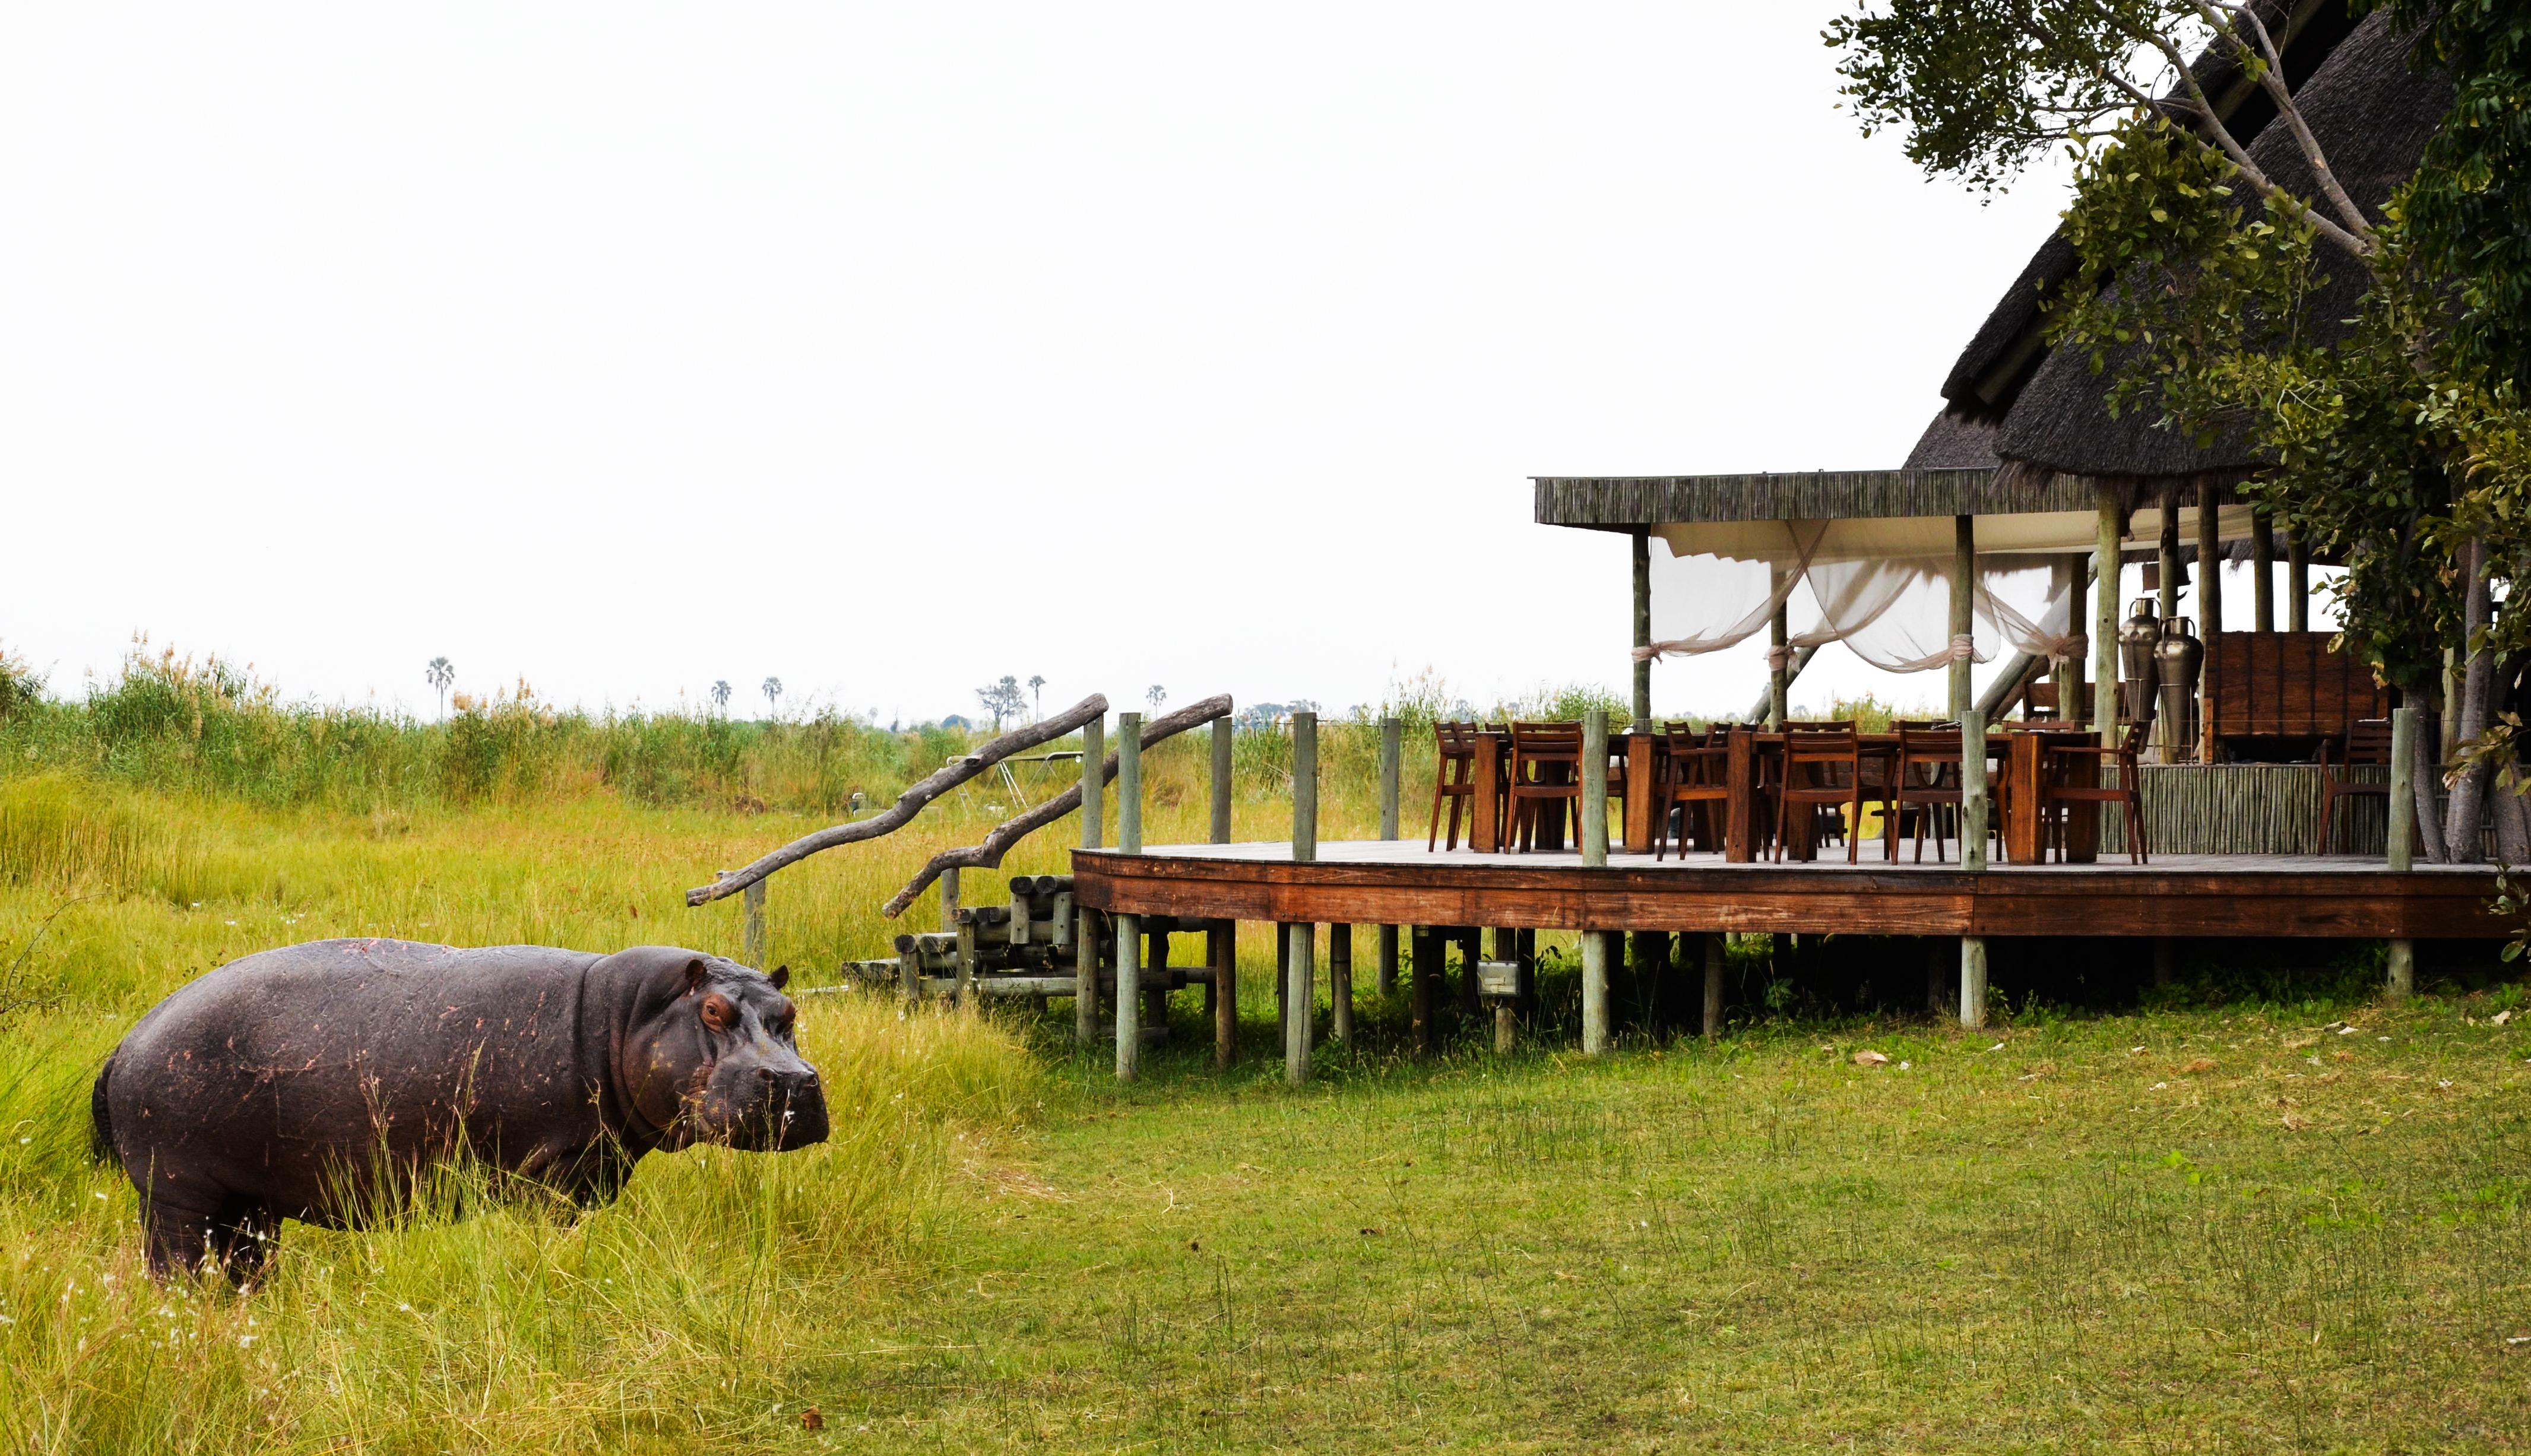 Selinda Camp Botswana Exterior Hippo